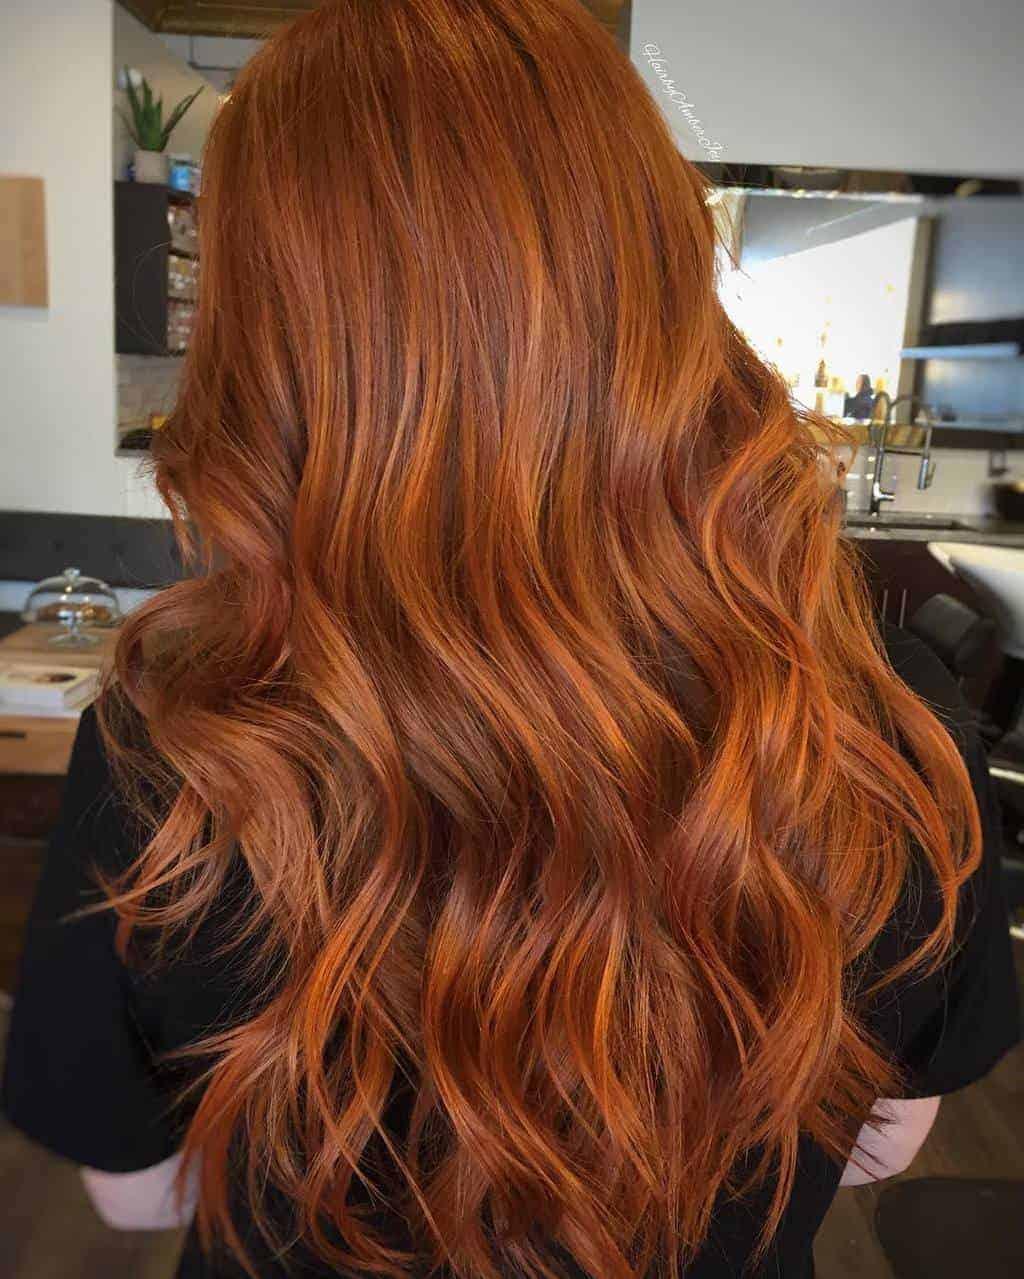 5 Long Auburn Hair Styles To Embrace An Autumnal Aesthetic